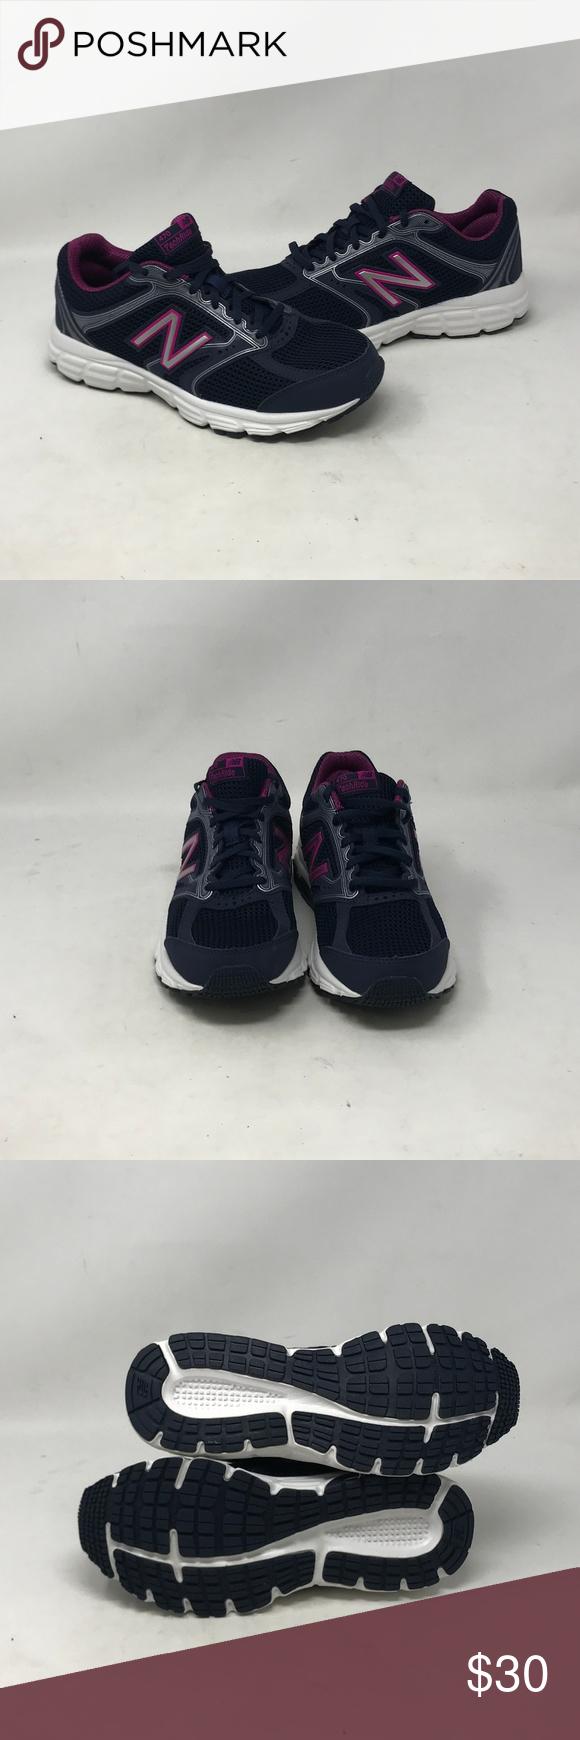 Womens running shoes, Running women